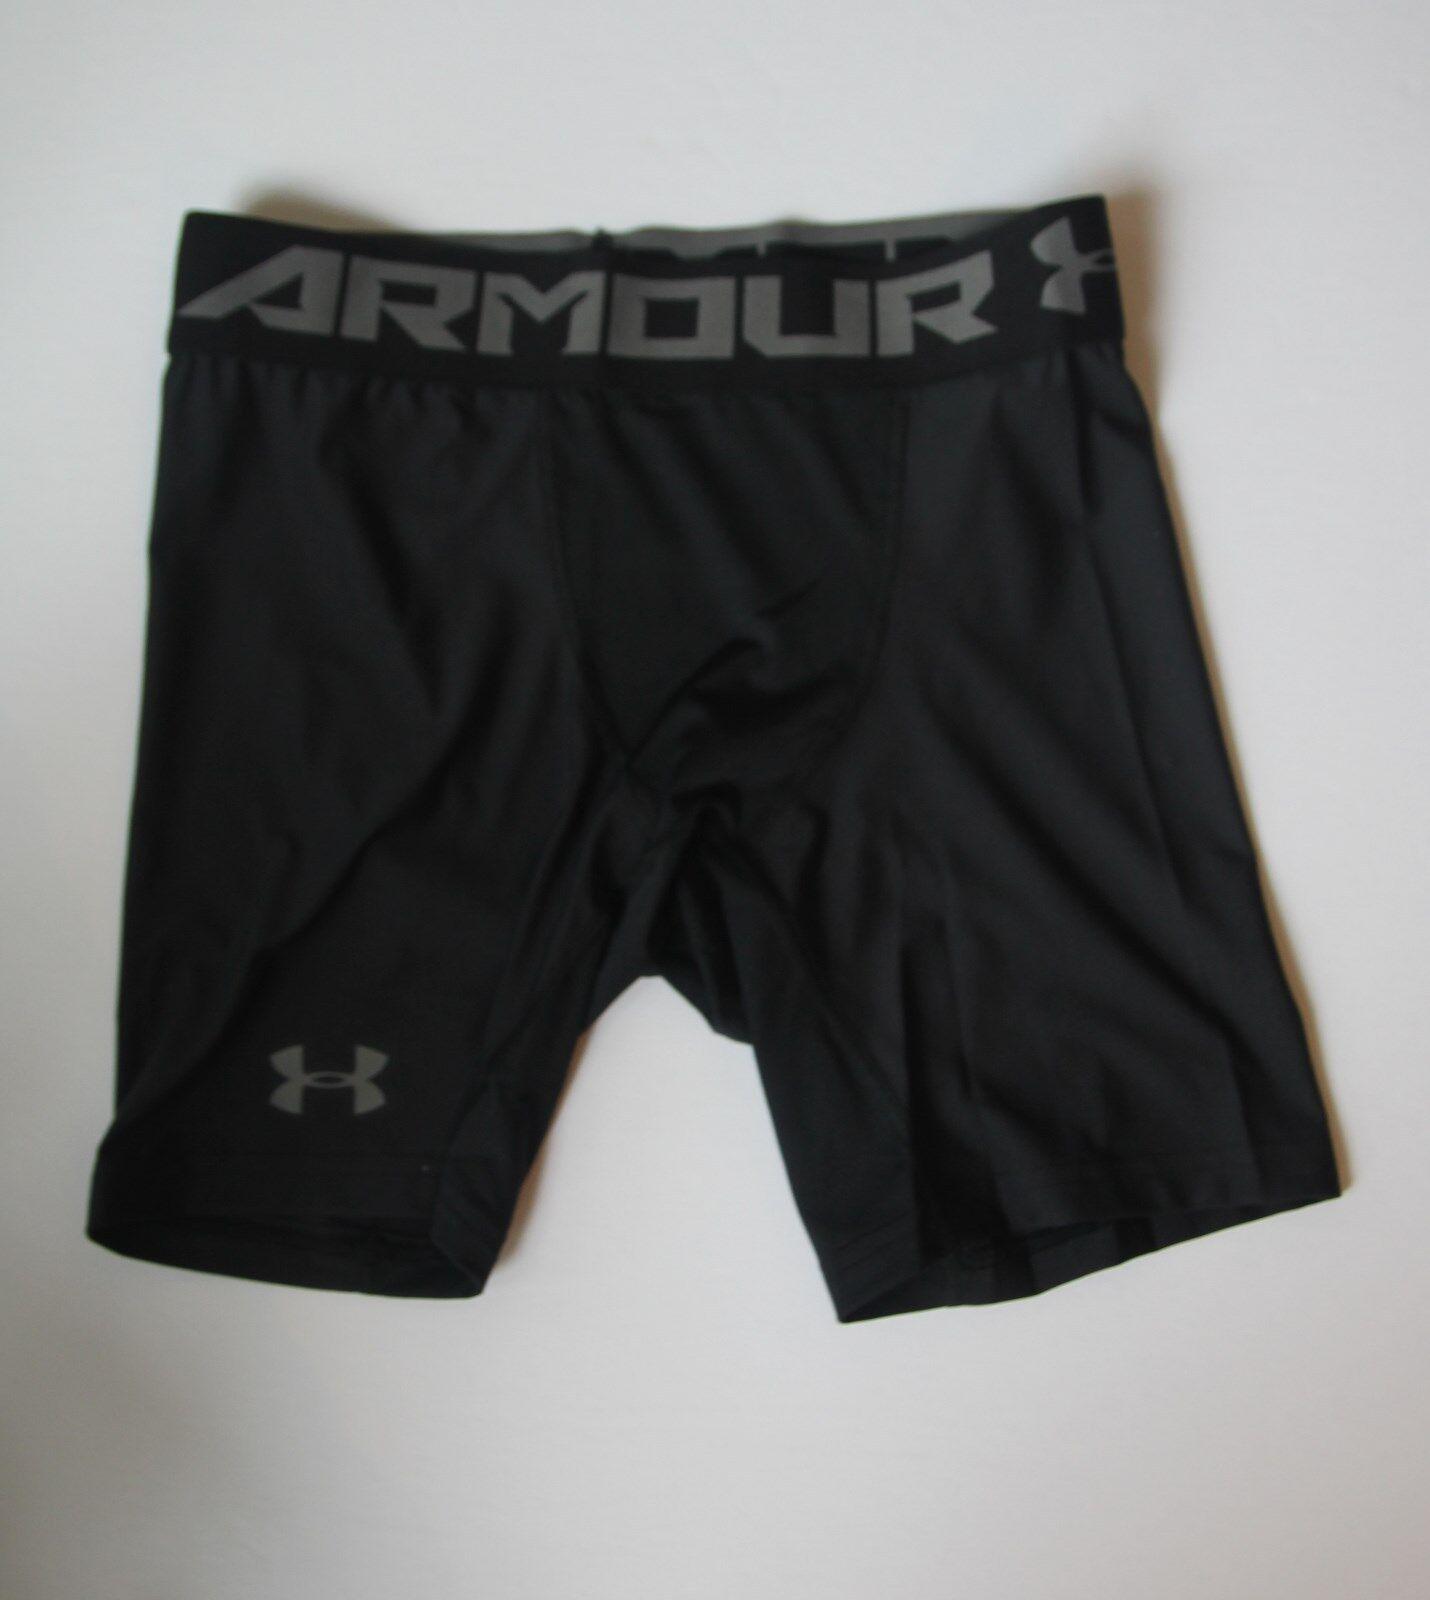 Under Armour Men's Heat Gear Compression Shorts   M L XL  XX